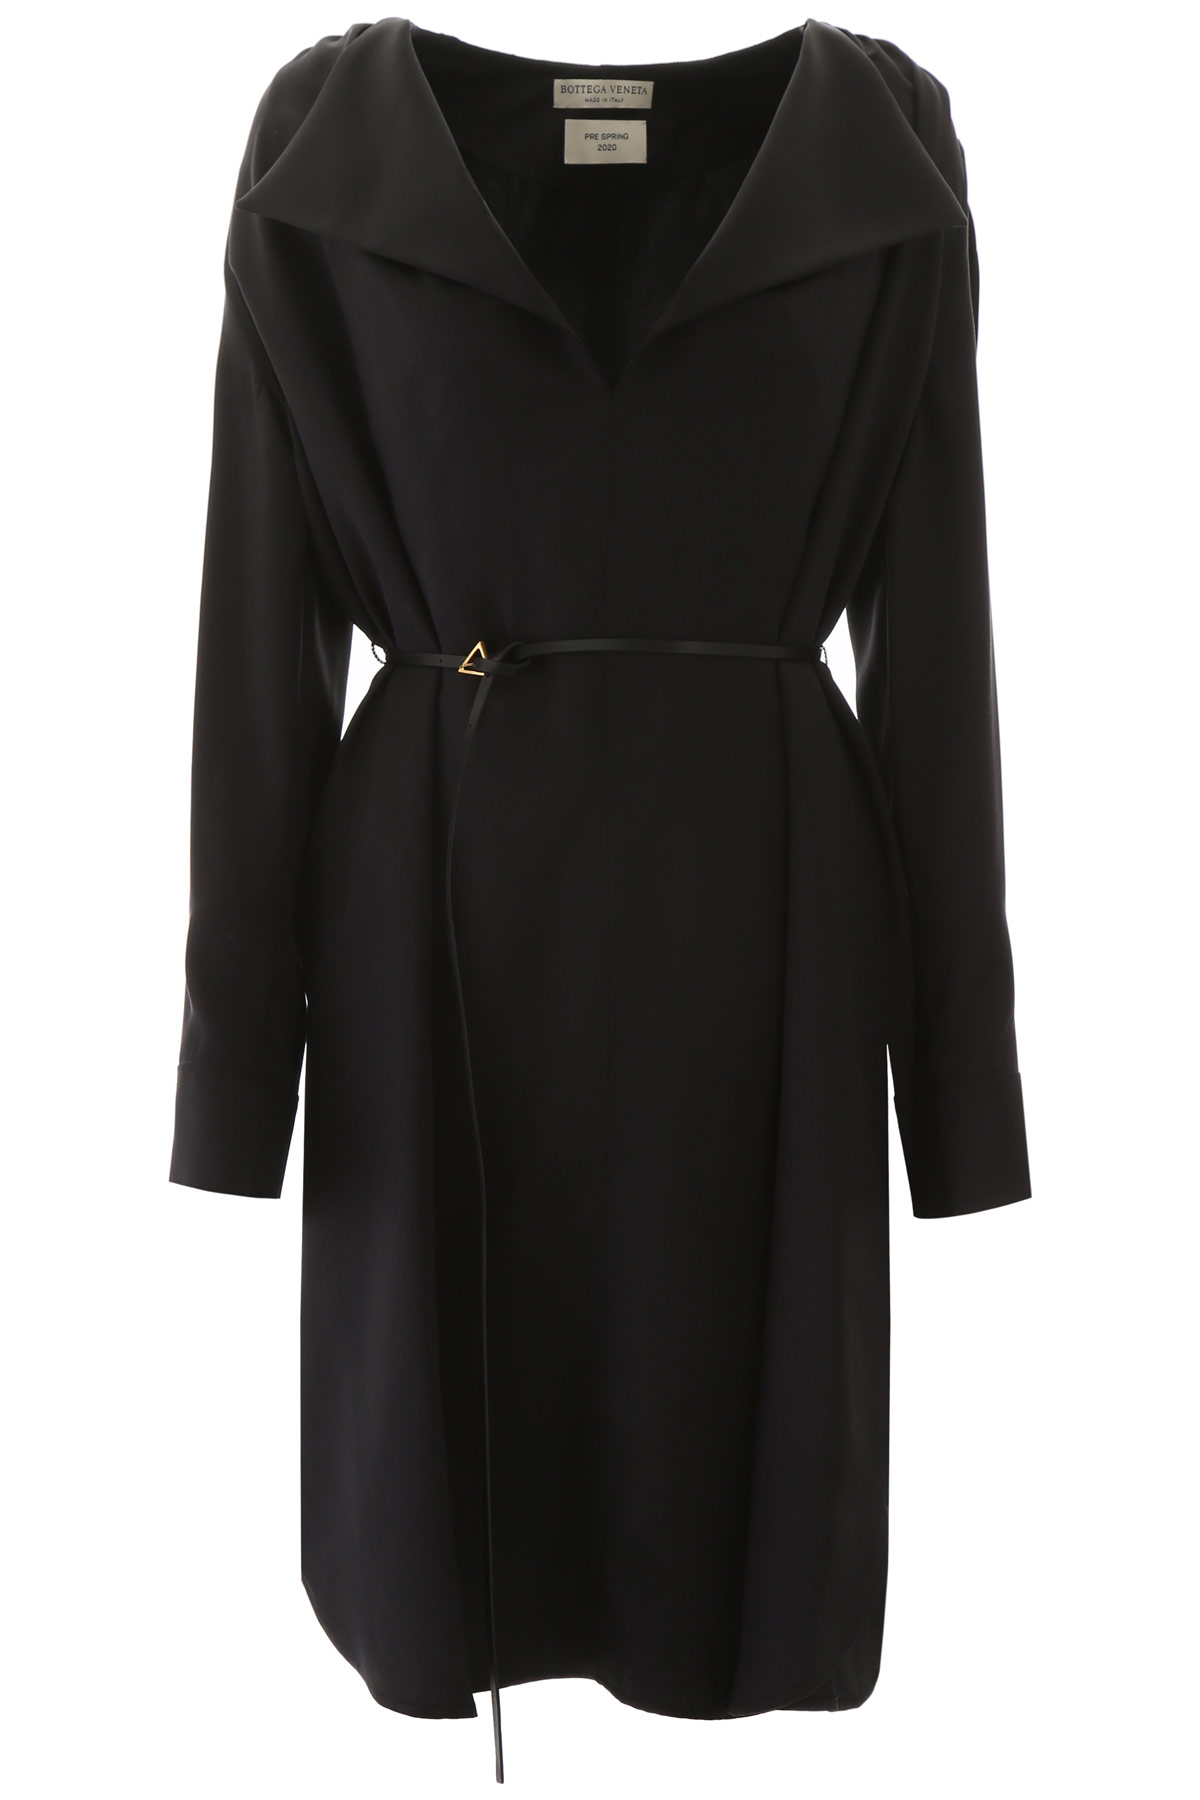 BOTTEGA VENETA TUNIC DRESS 40 Black Silk